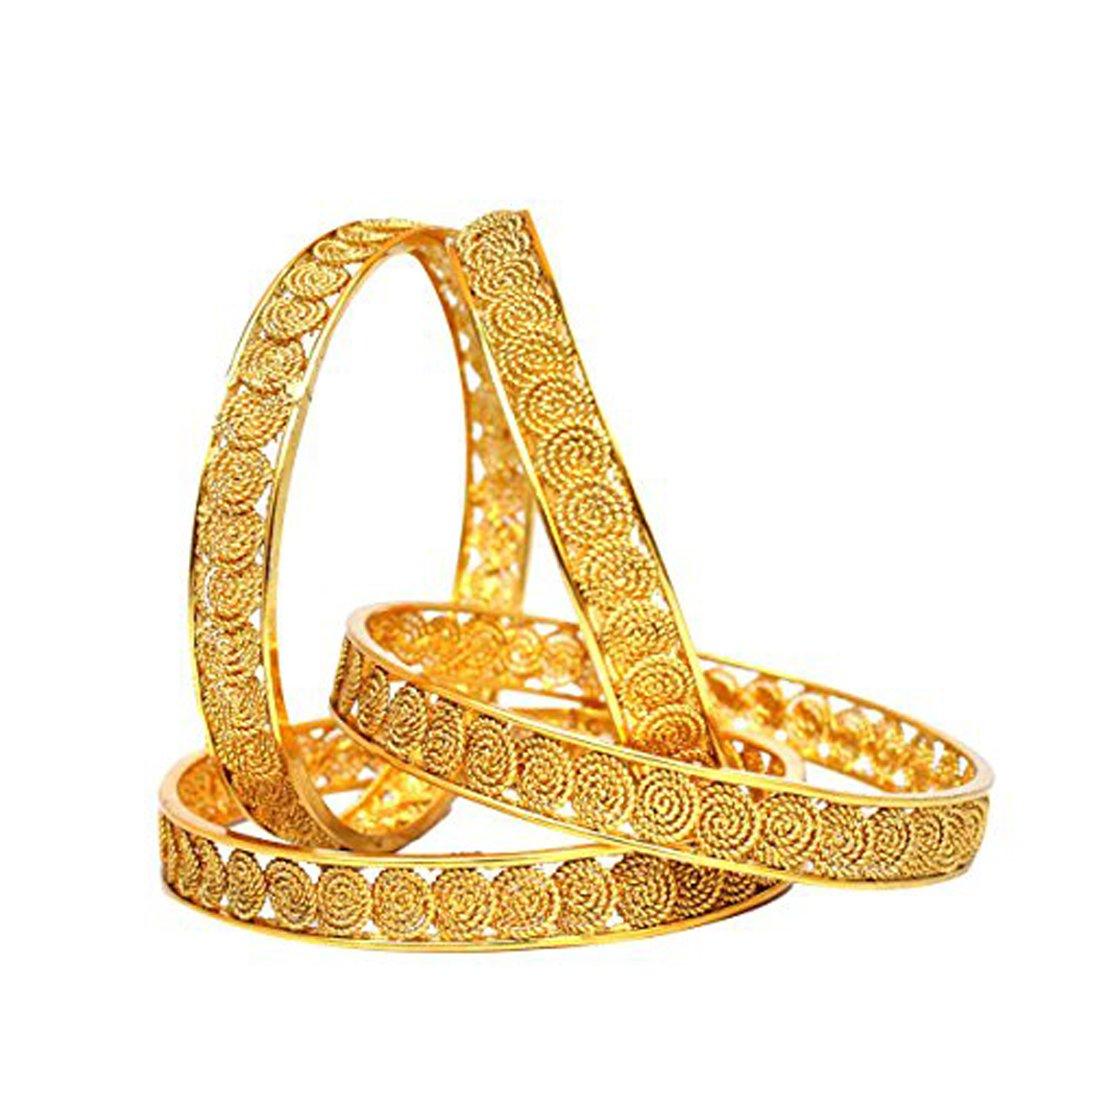 Buy Sanara Ethnic Gold Plated Bridal Bangle Kada Set Wedding Partywear Jewelry 2 6 At Amazon In